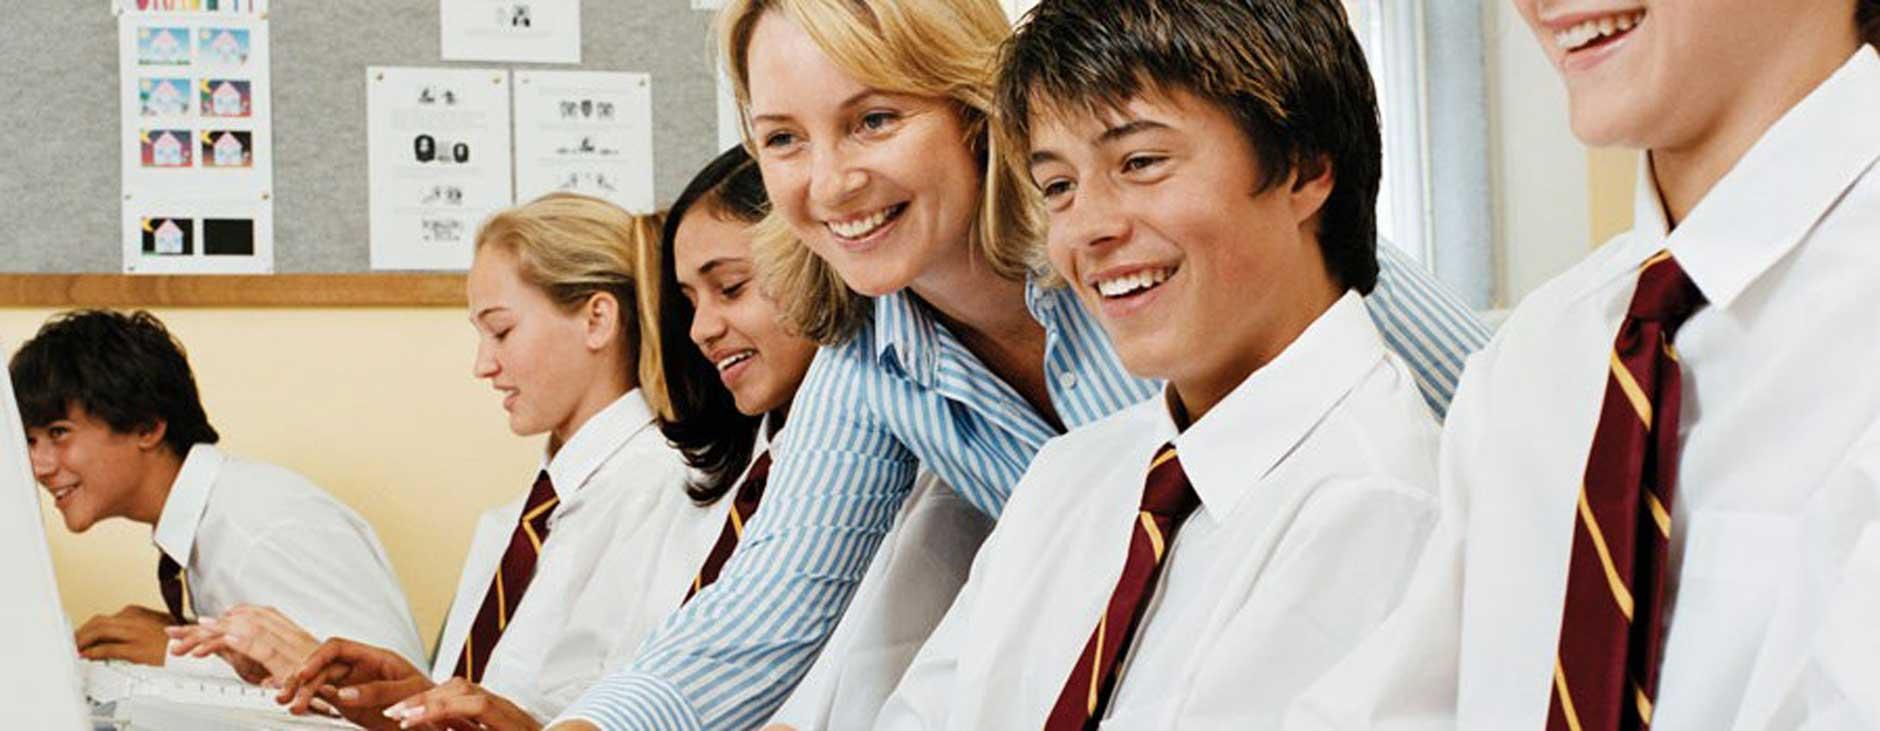 Maze School Management System